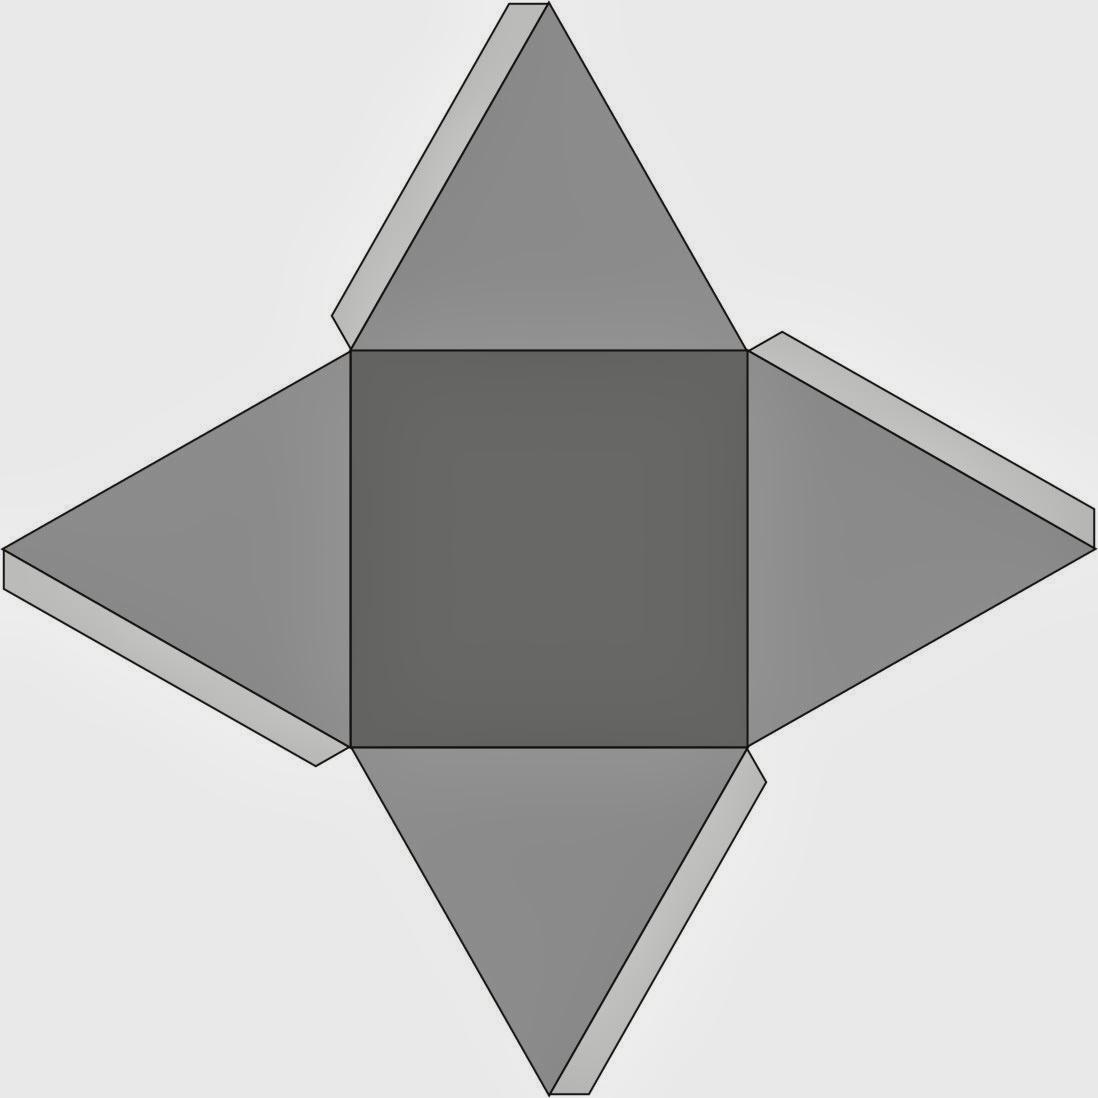 Como Hacer Una Piramide Imagui